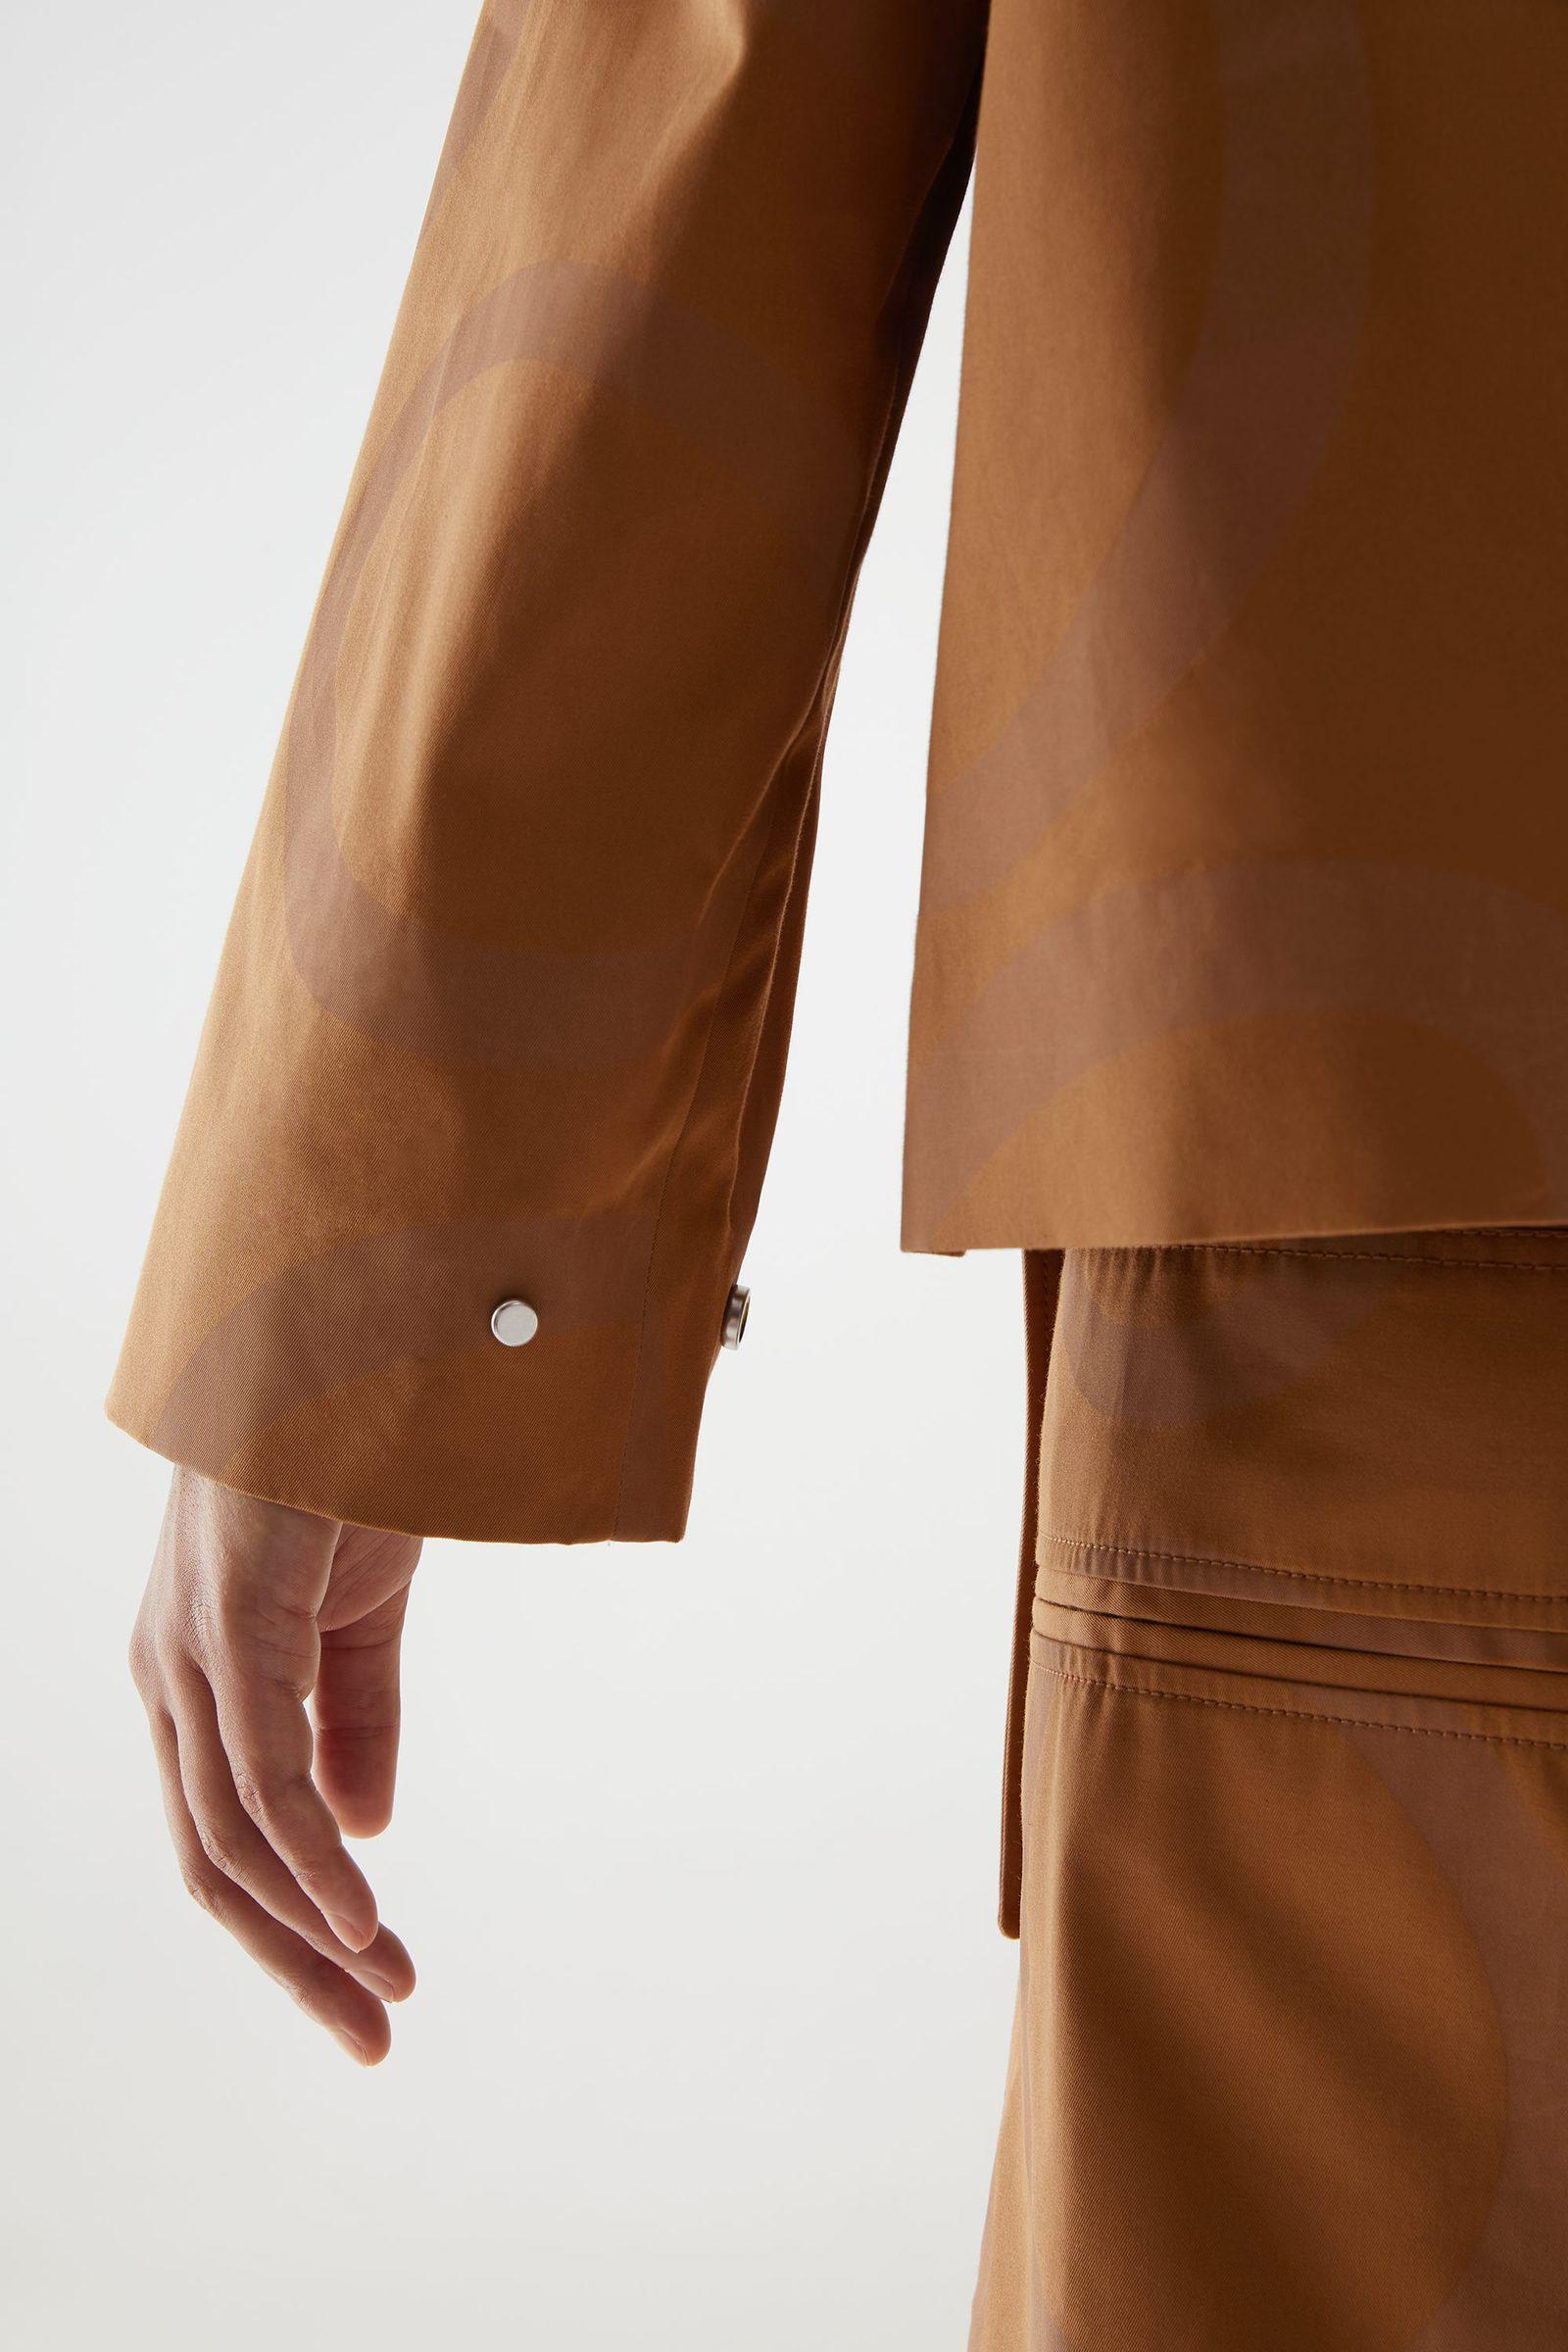 COS 프린티드 코튼 재킷의 베이지 / 브라운컬러 ECOMLook입니다.